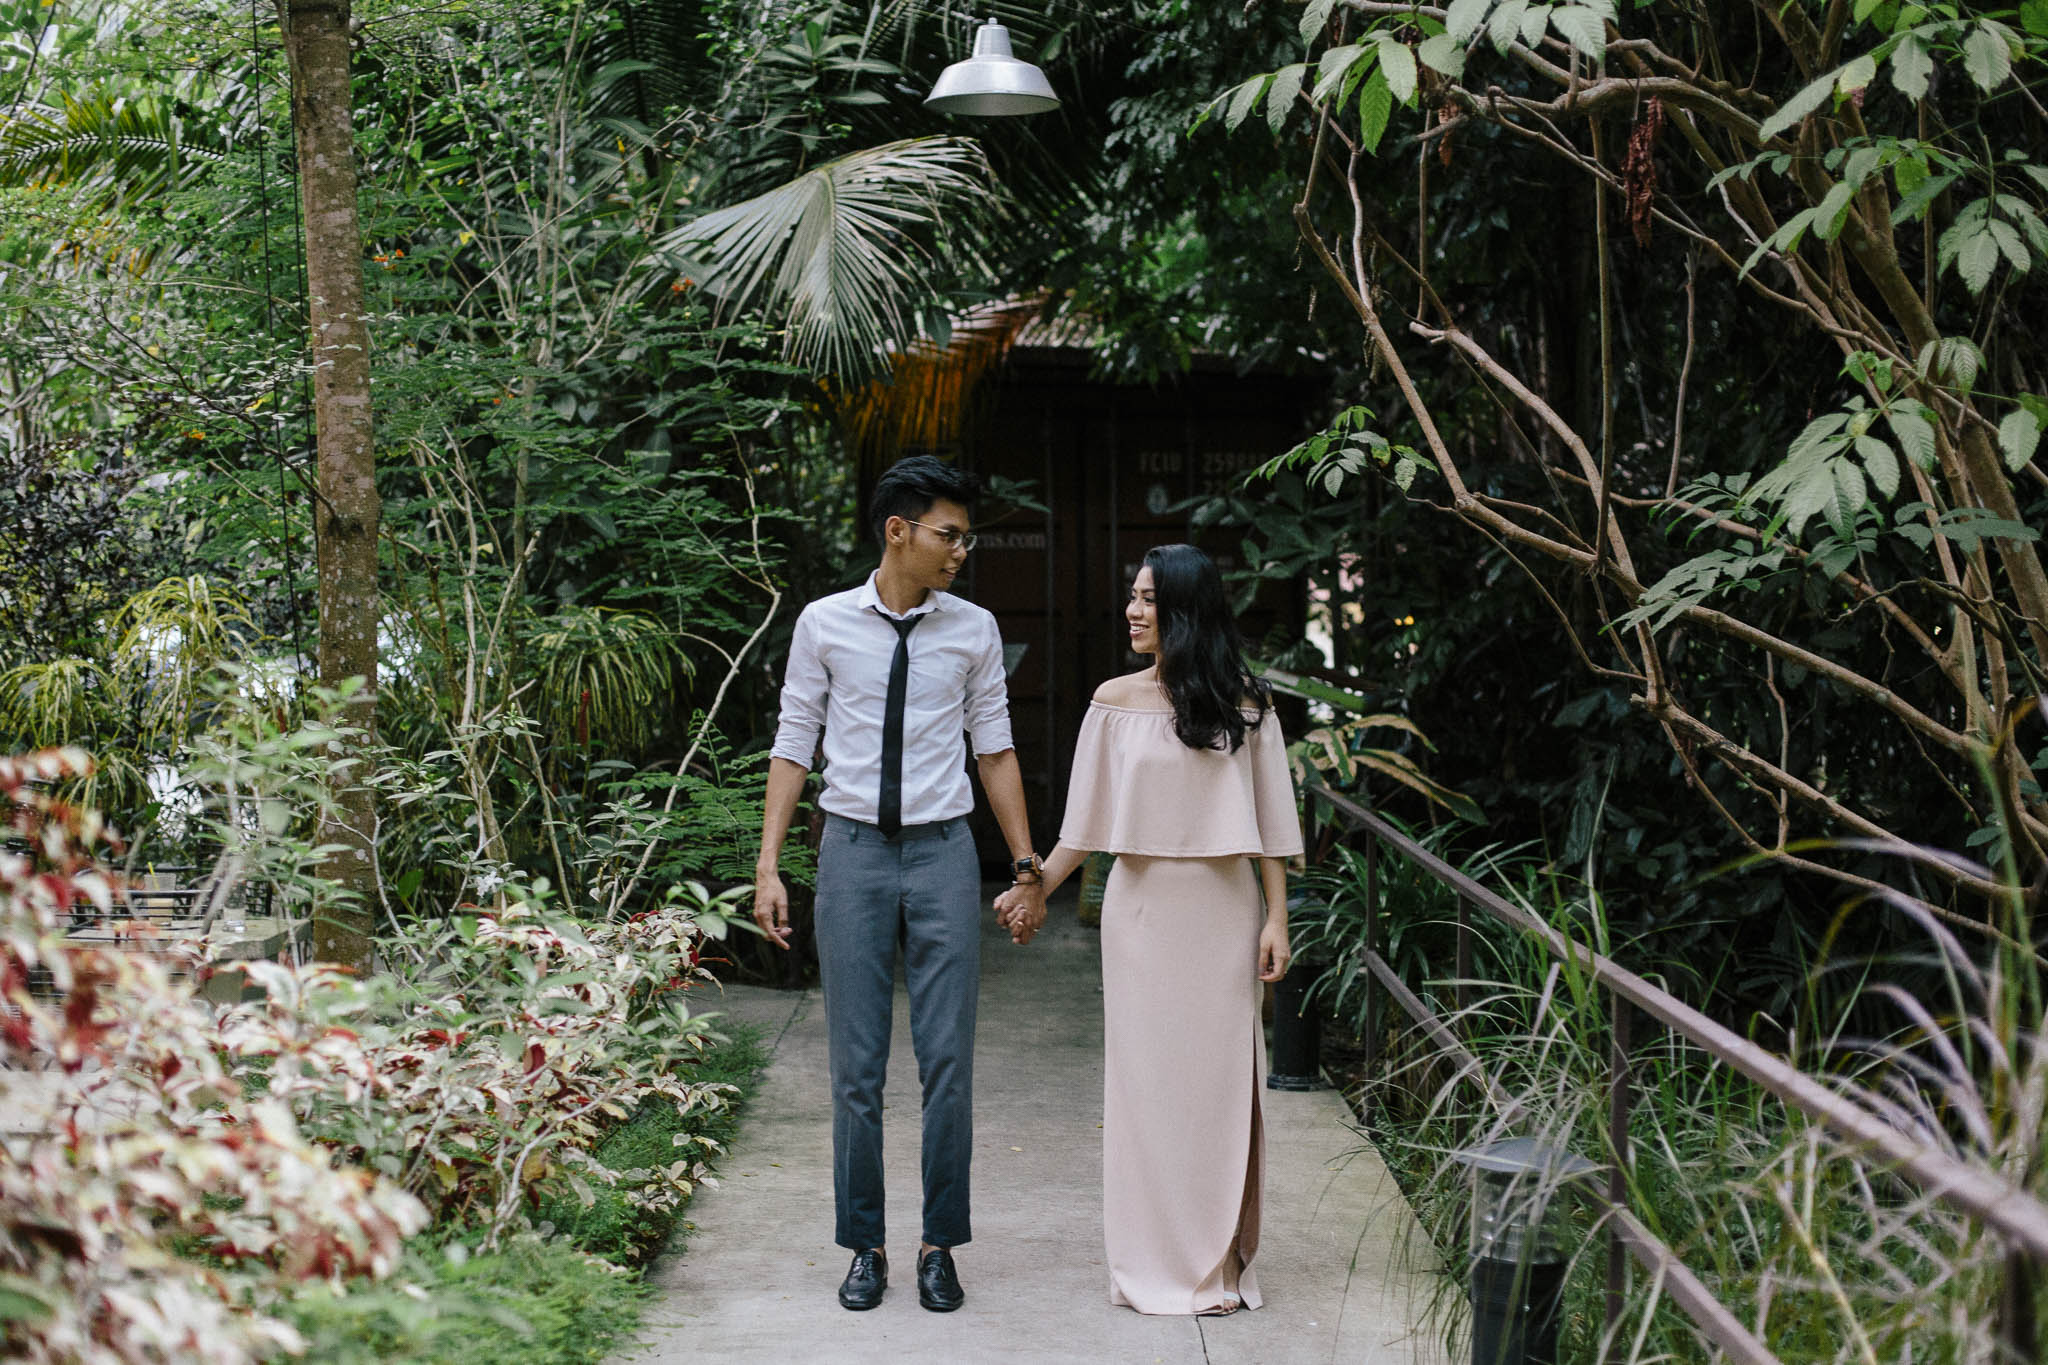 singapore-wedding-photographer-malay-travel-adli-tashah-40.jpg